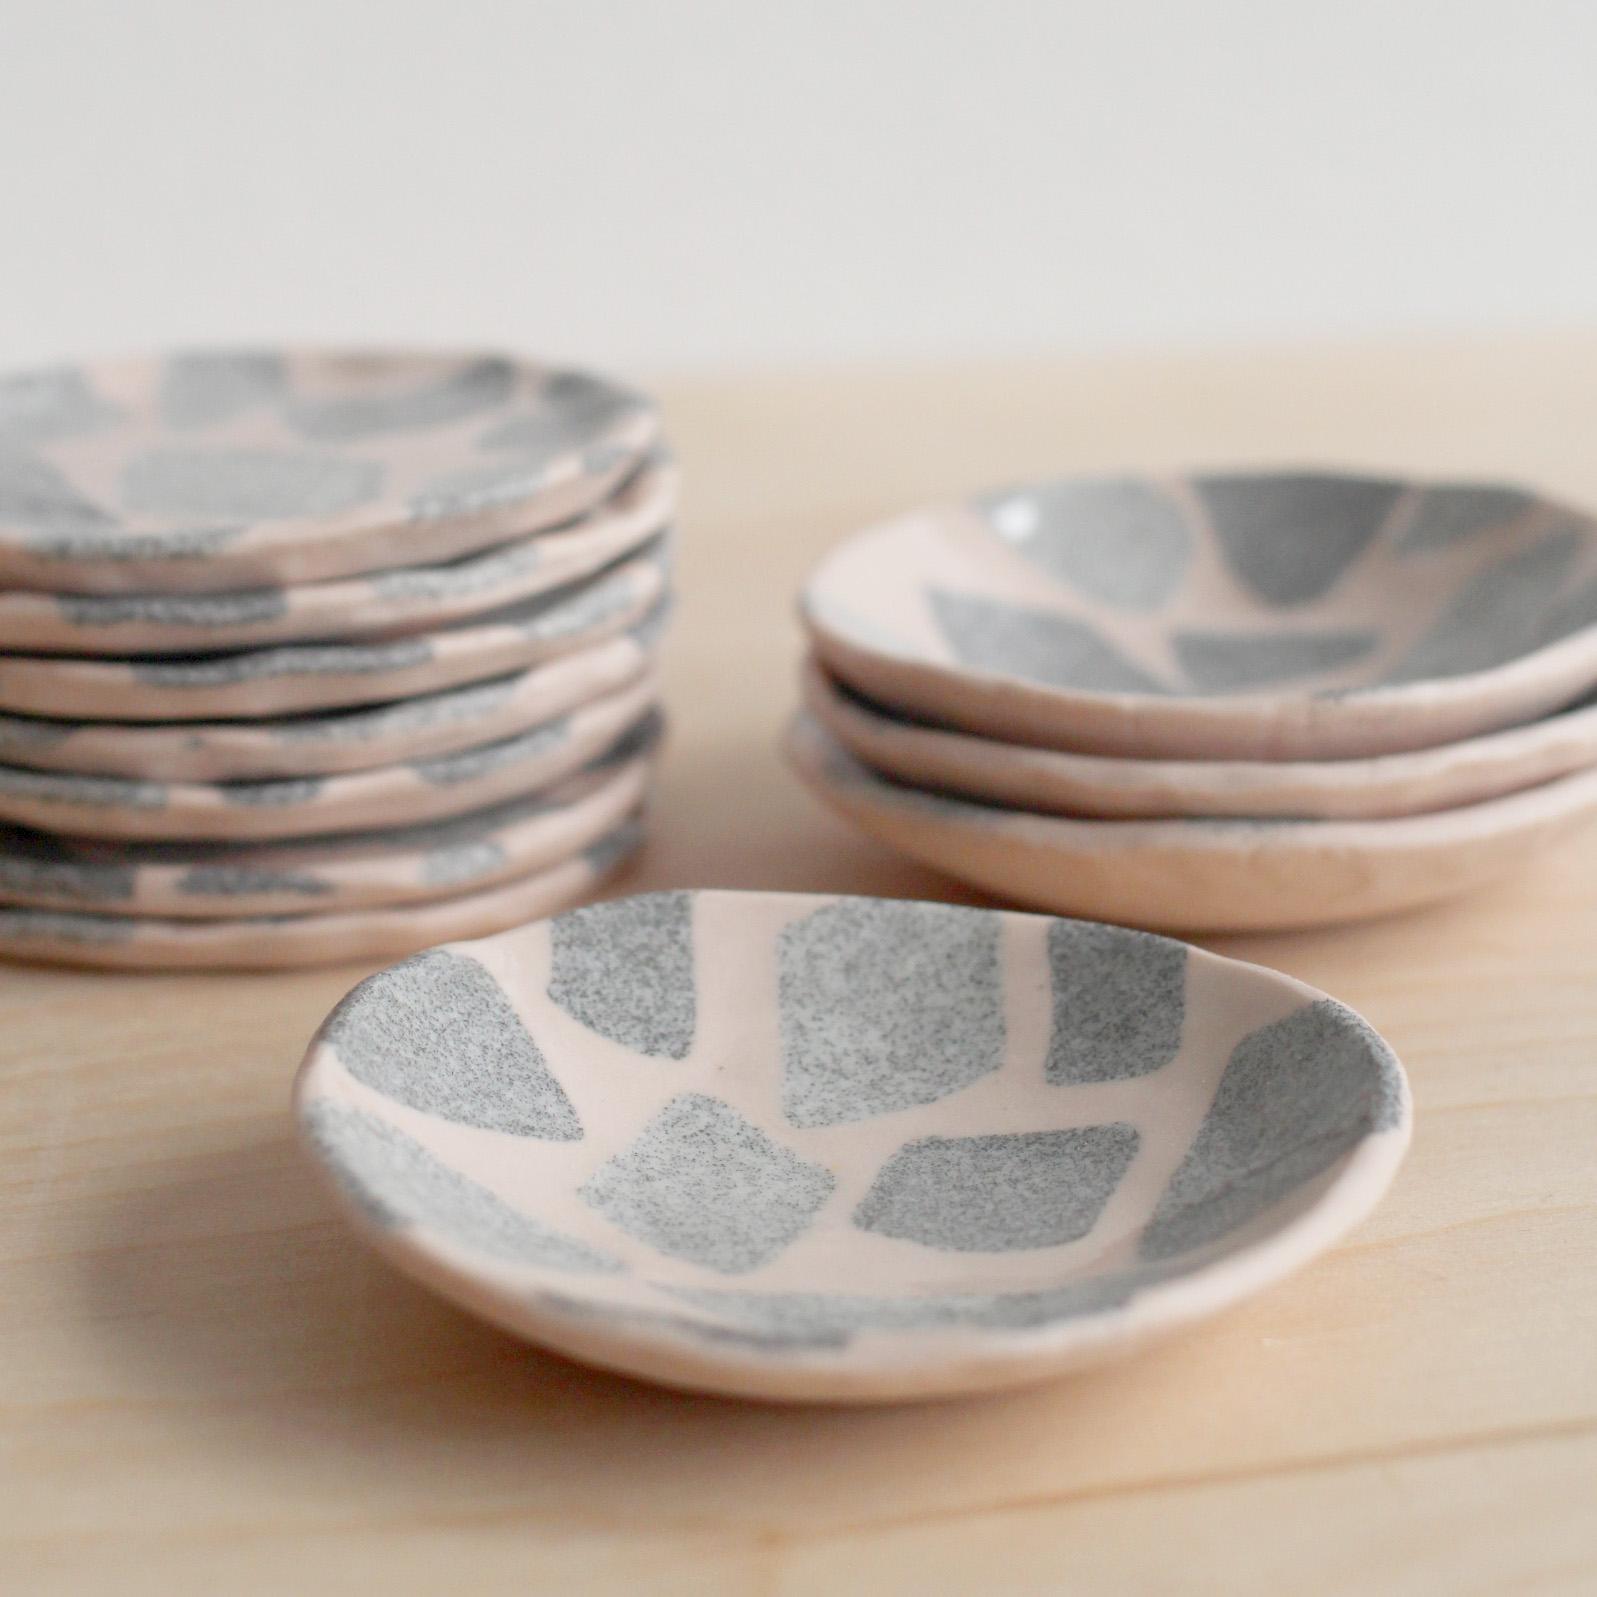 Tiny Terrazzo Dishes - Retail $22